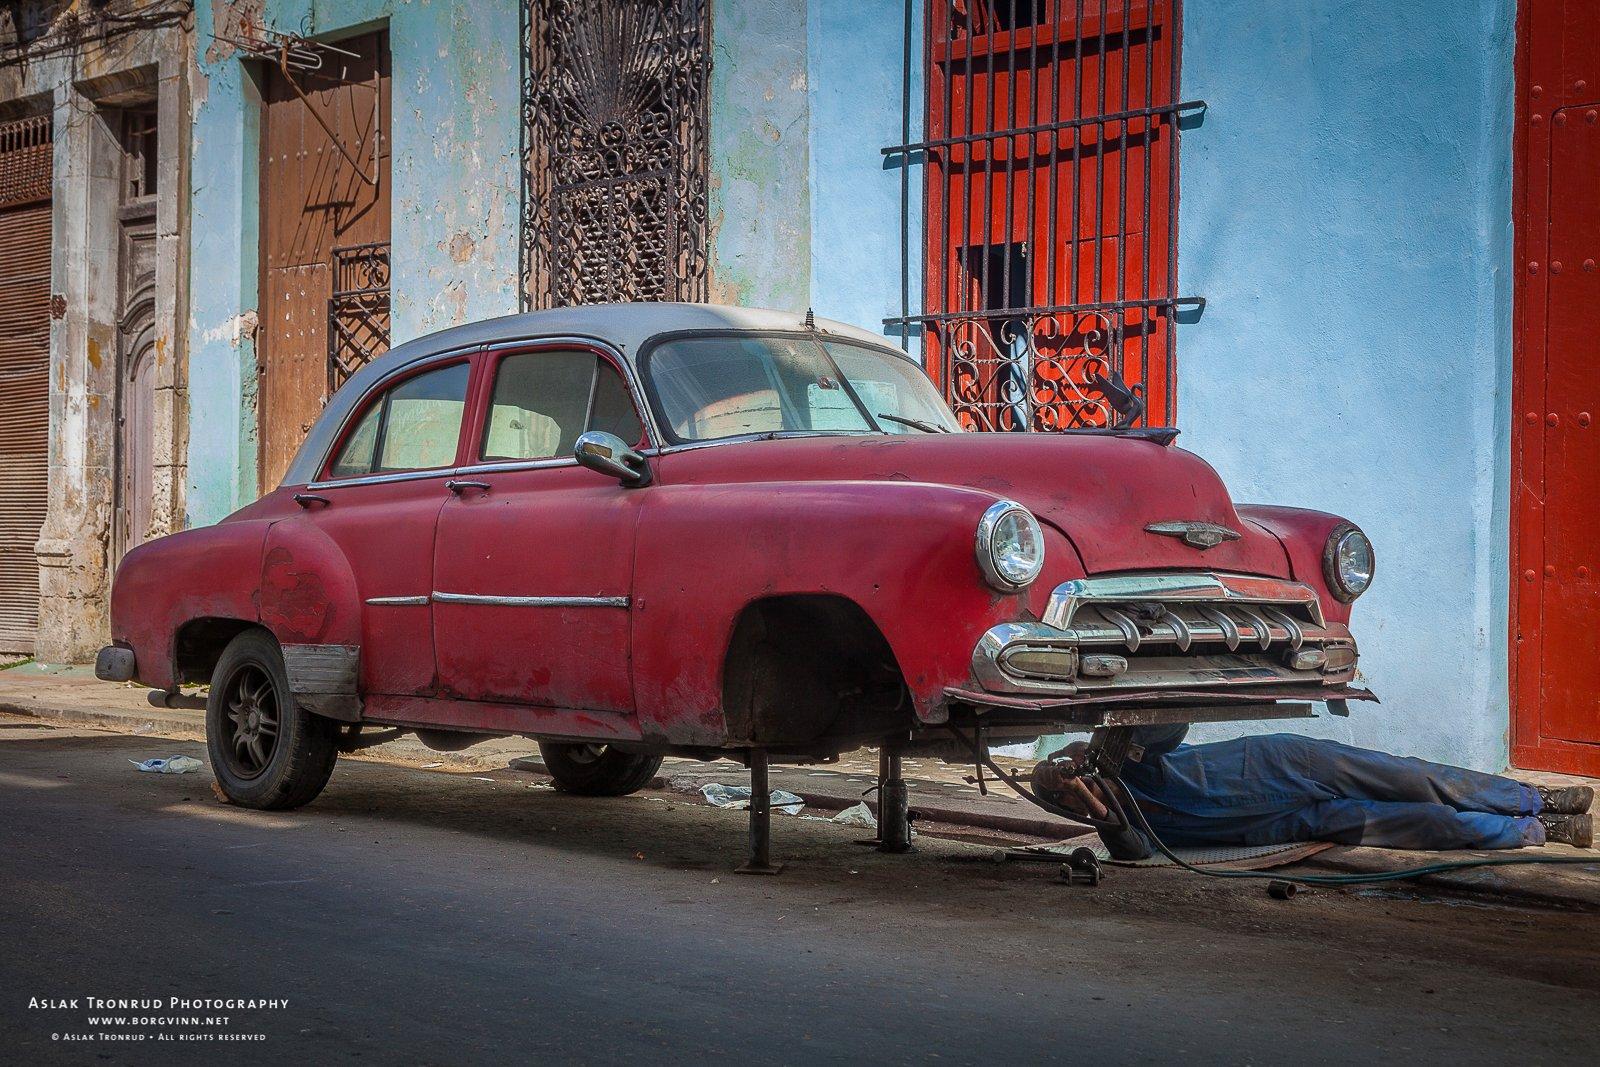 A man lays under a car holding a mechanical work tool.